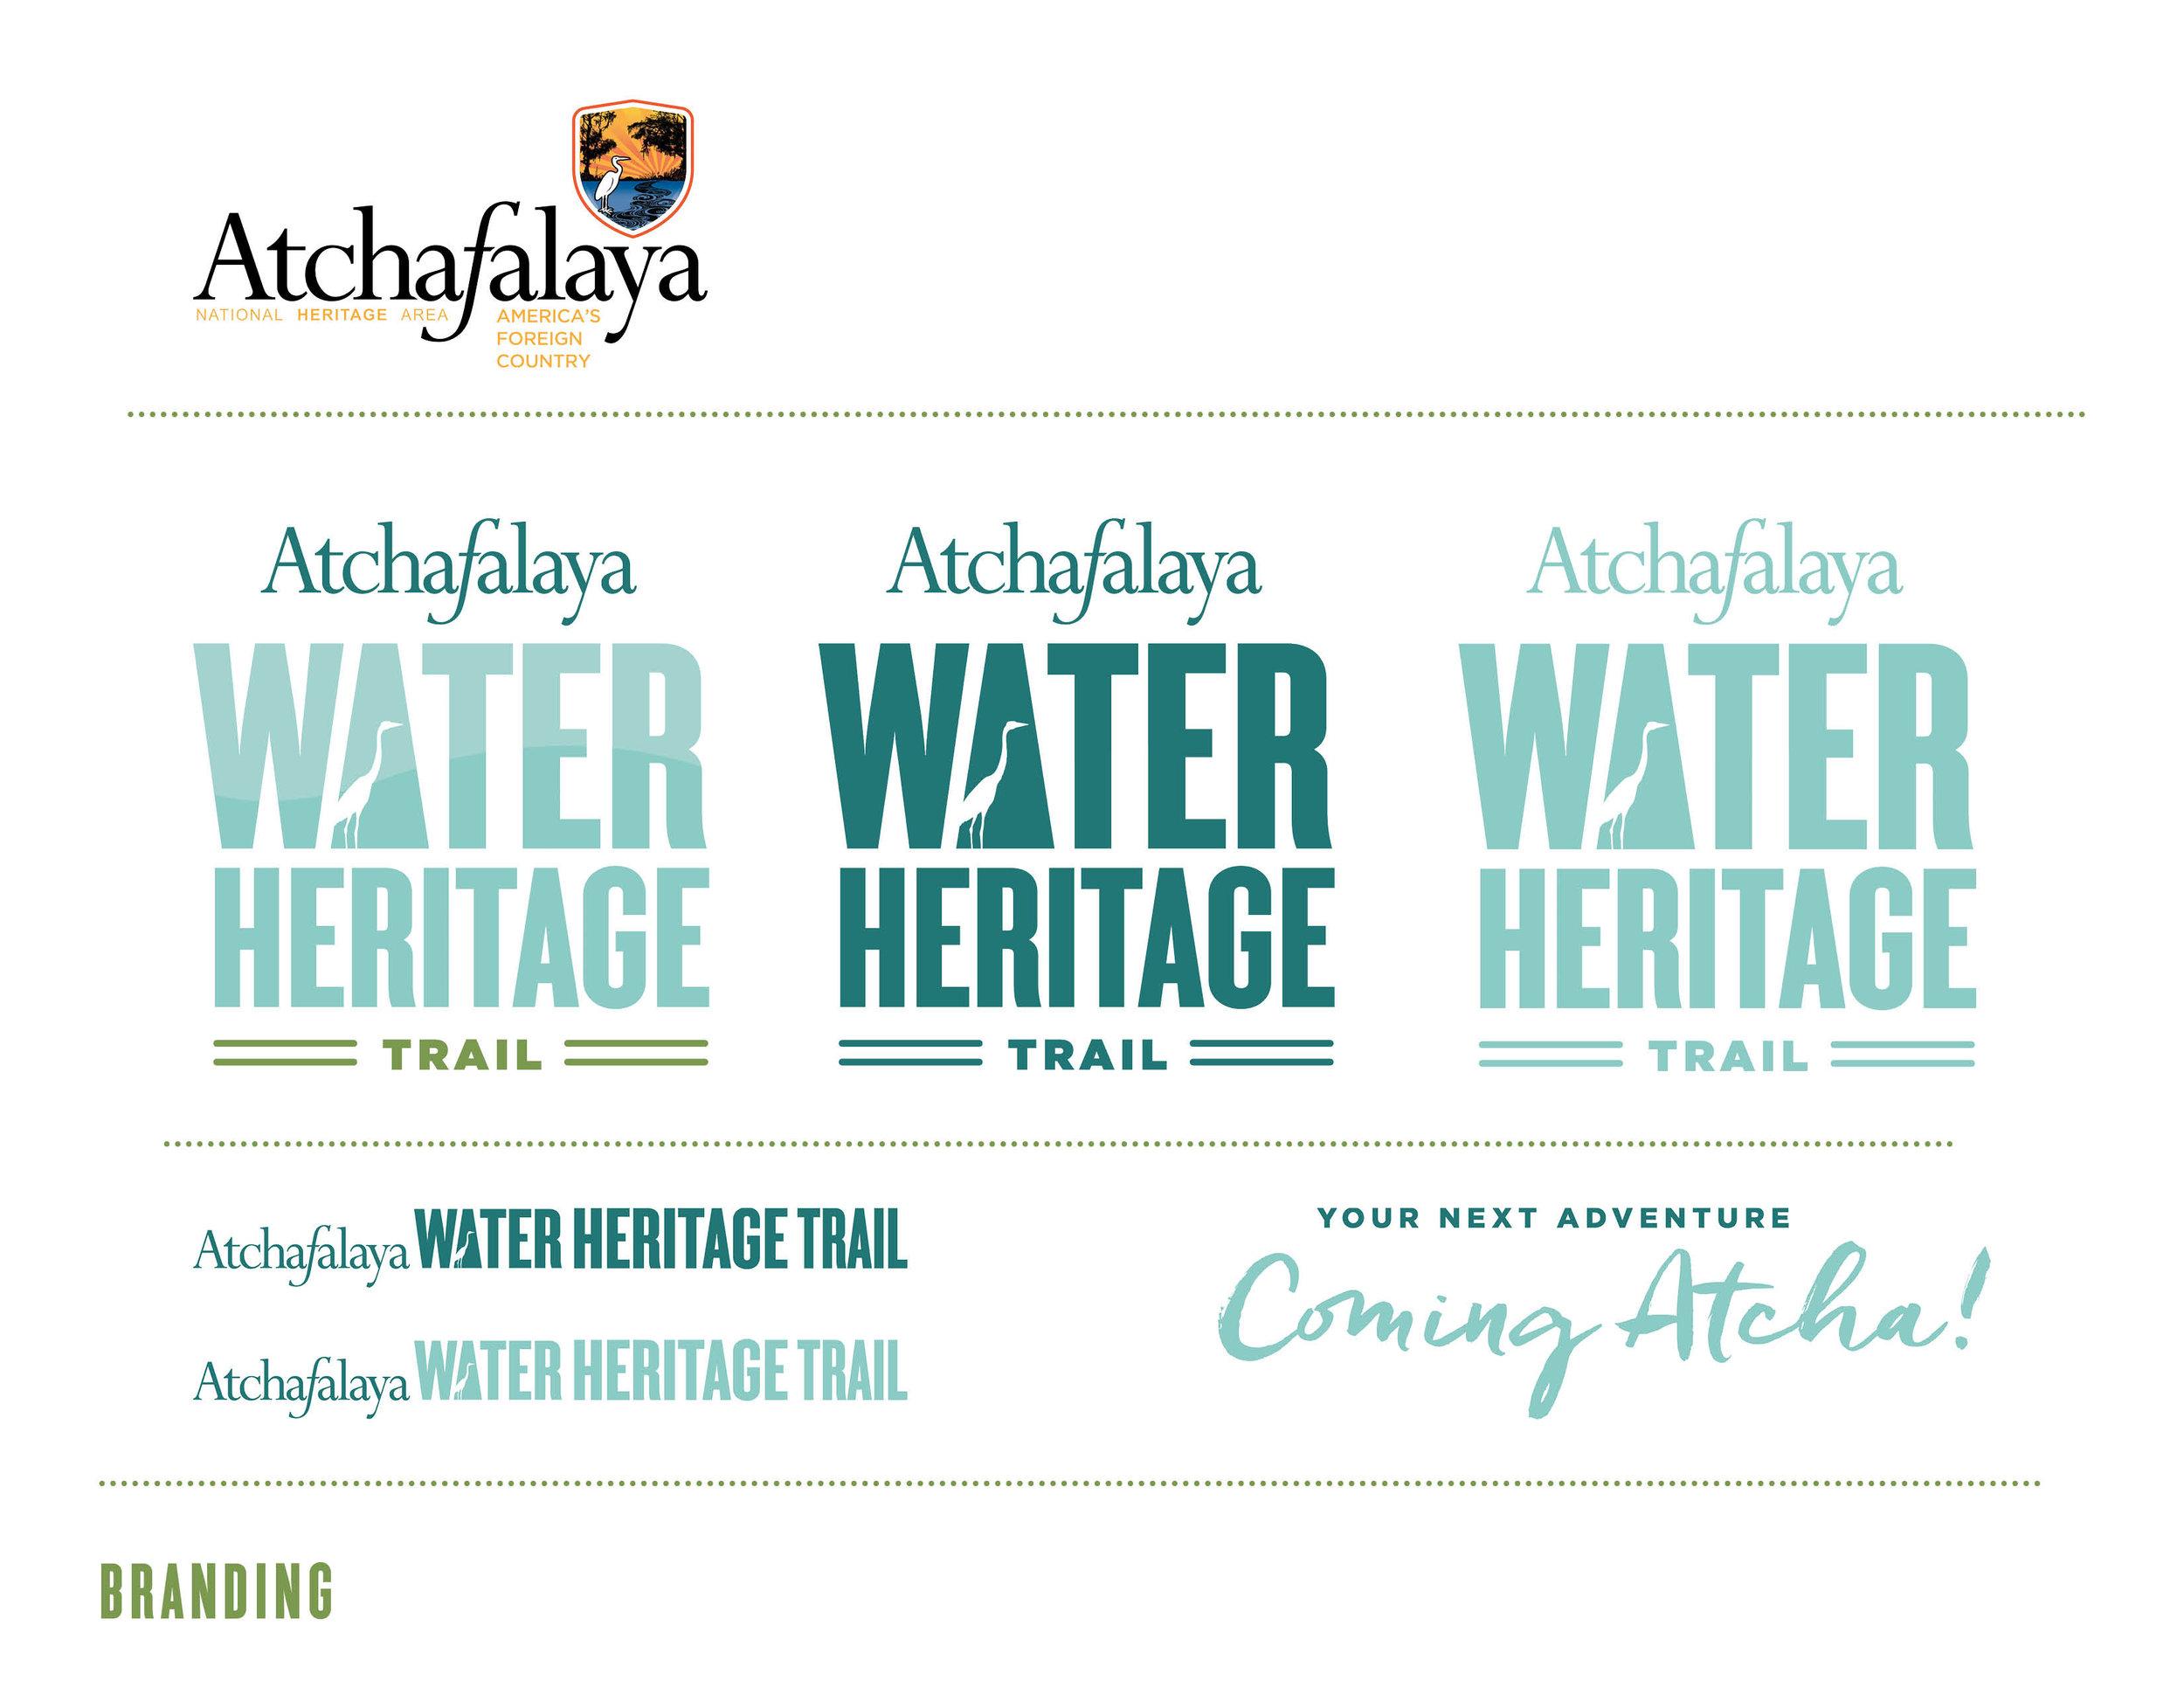 Atchafalaya_Slide3.jpg